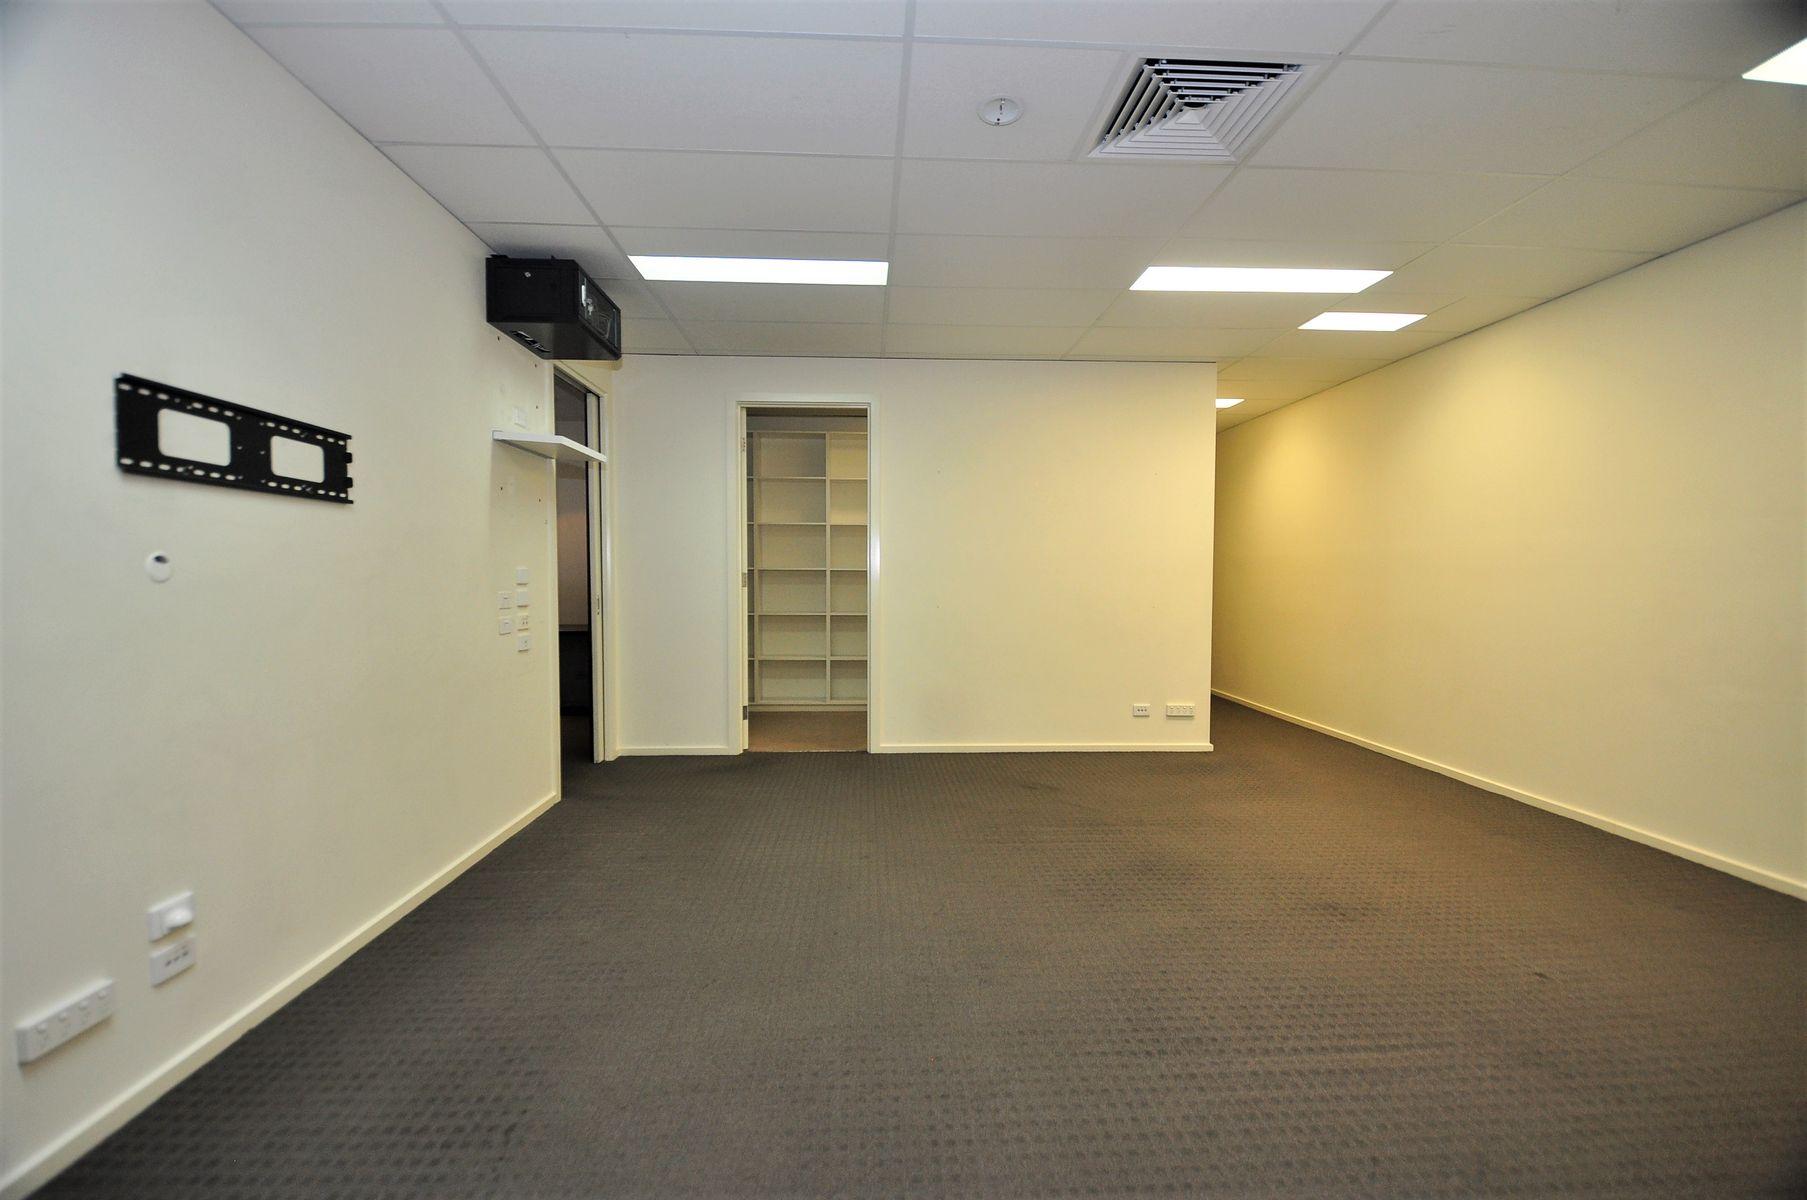 145 View Street, Bendigo, VIC 3550